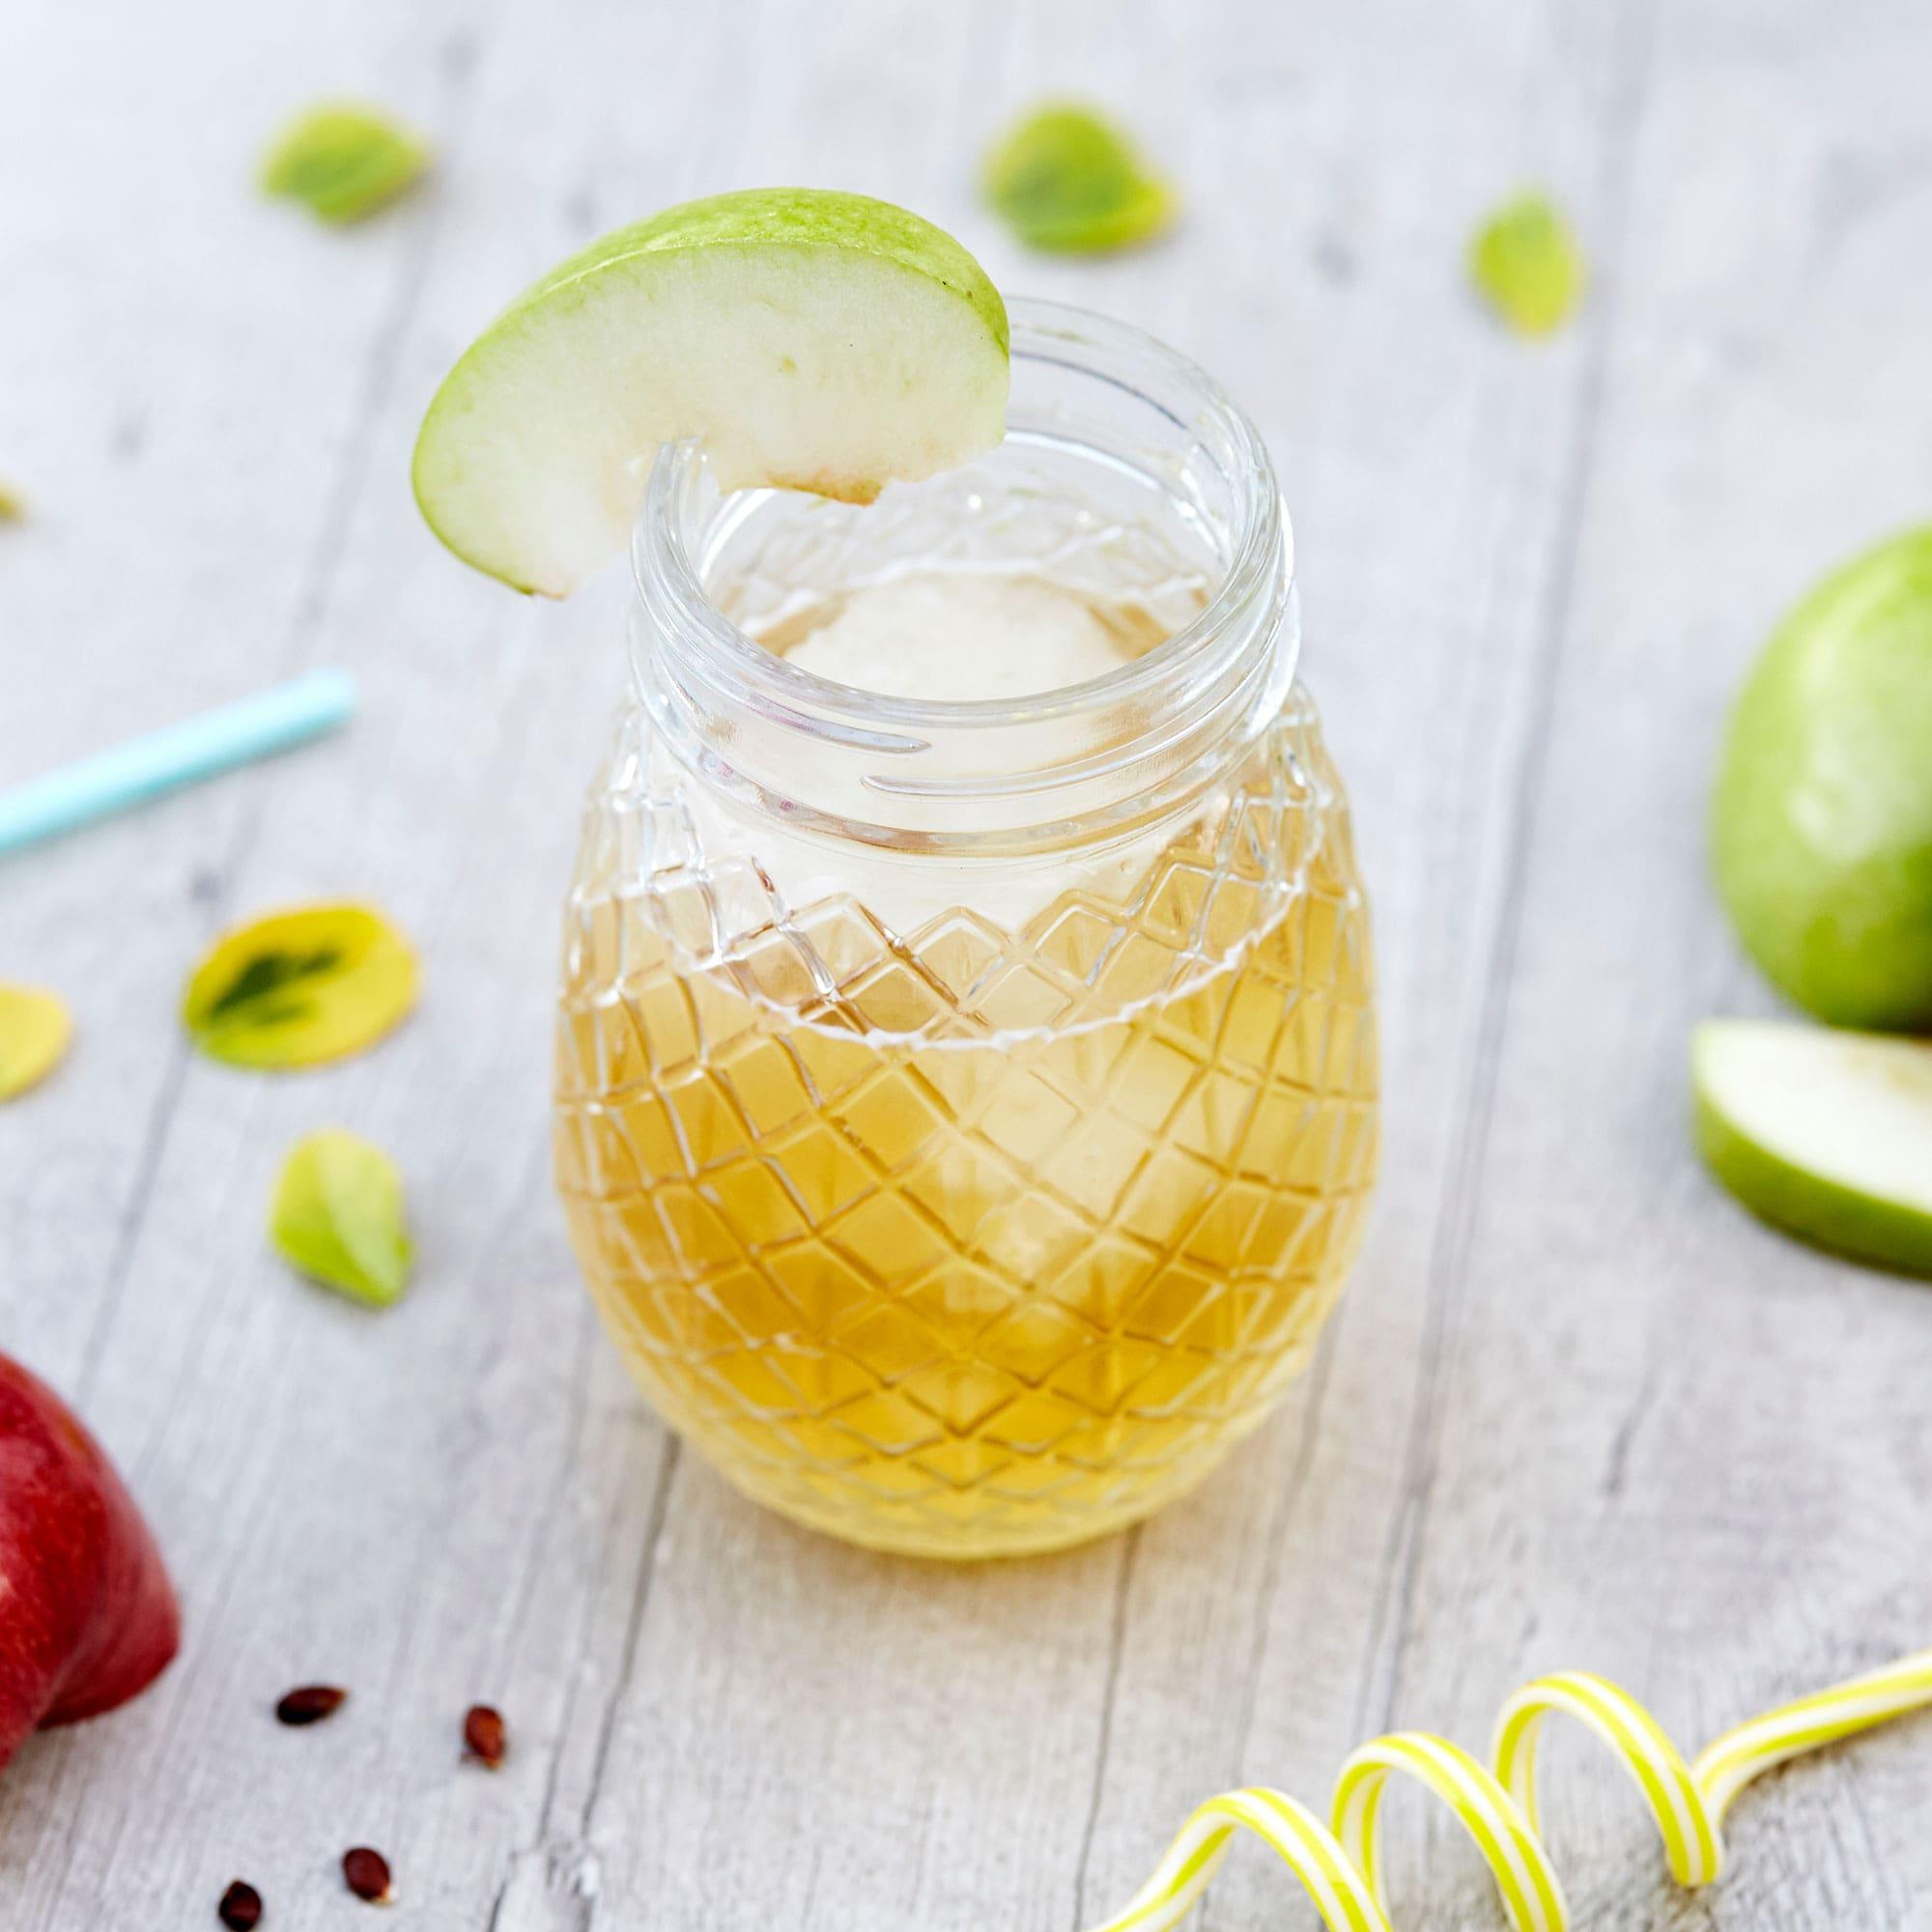 tropical-cider-coc-min